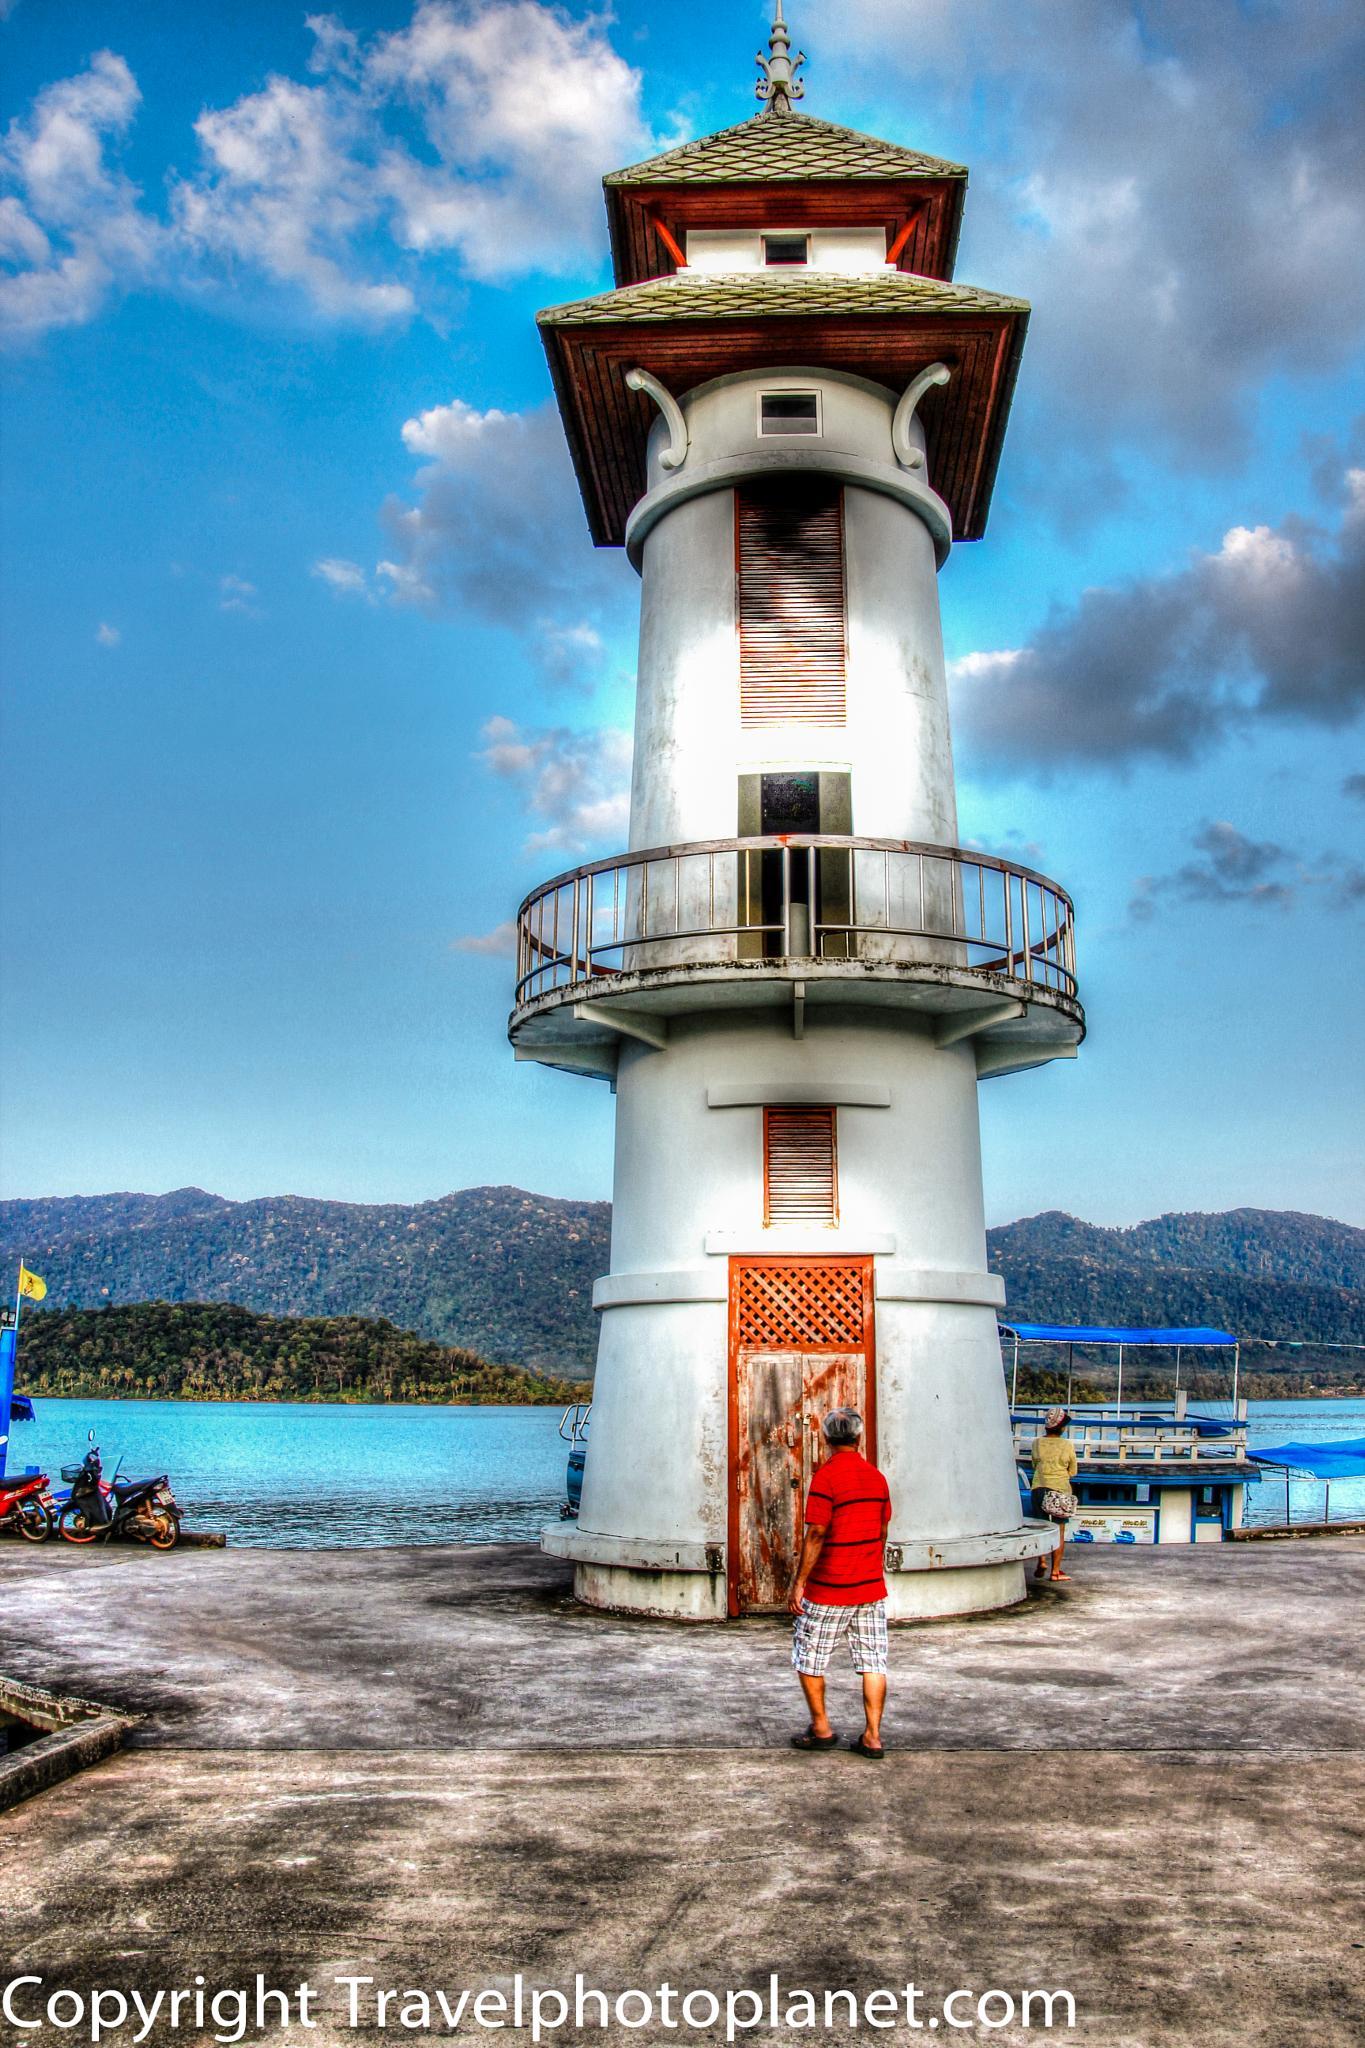 HDR Lighthouse by Svein Arne Grønnevik